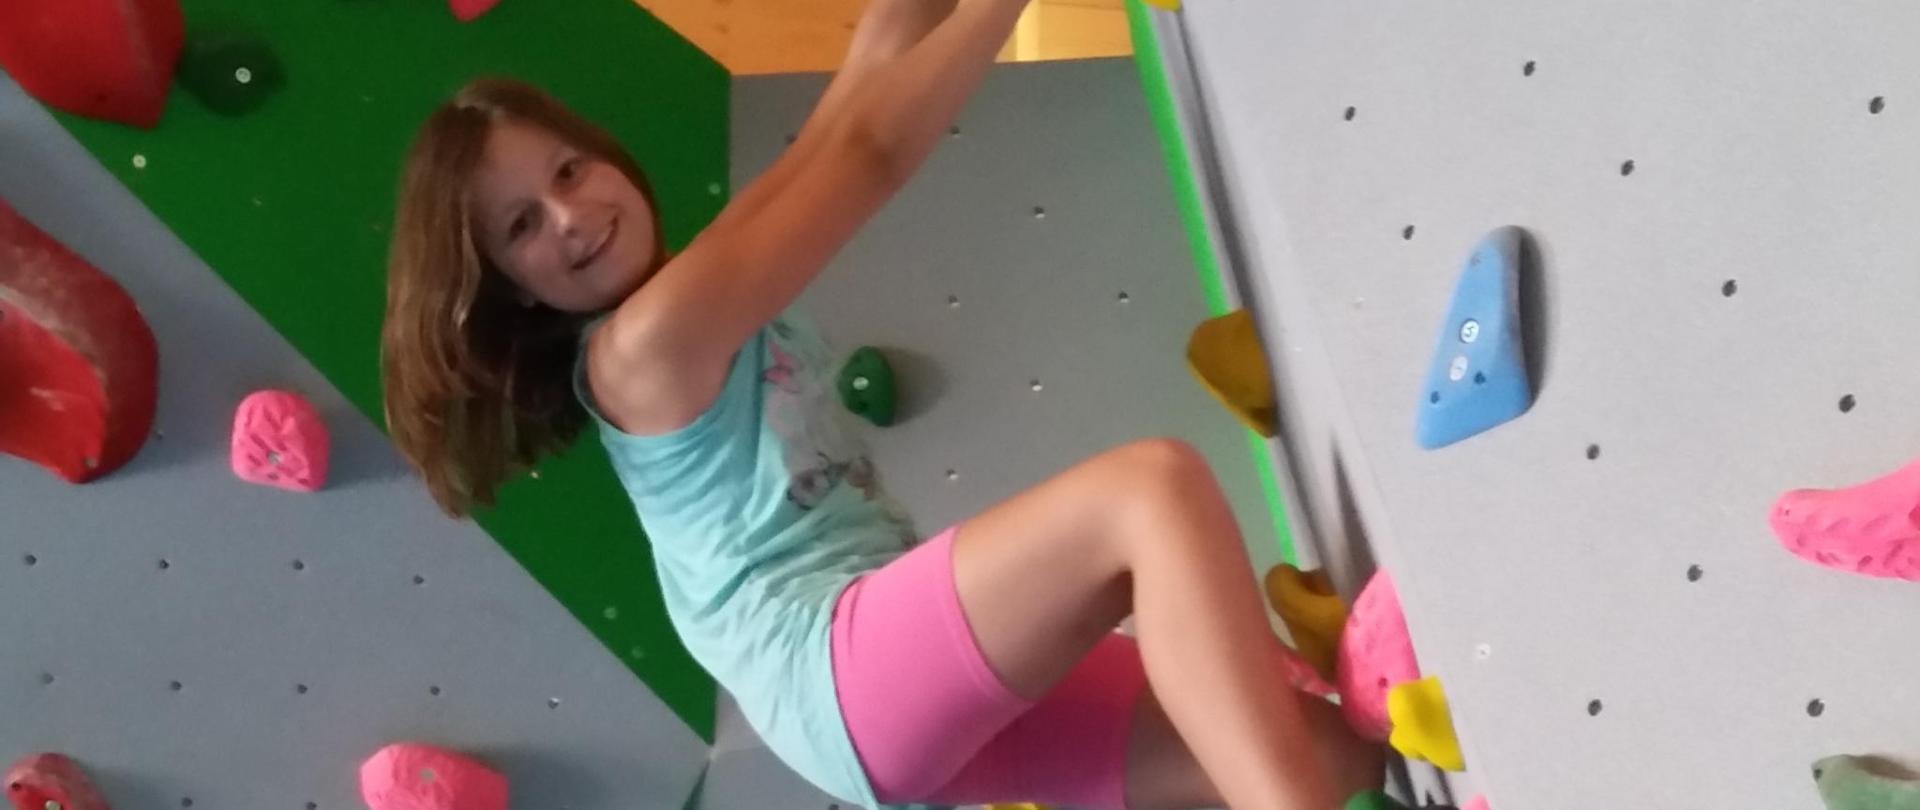 Alicia Kinderklettern quer.jpg